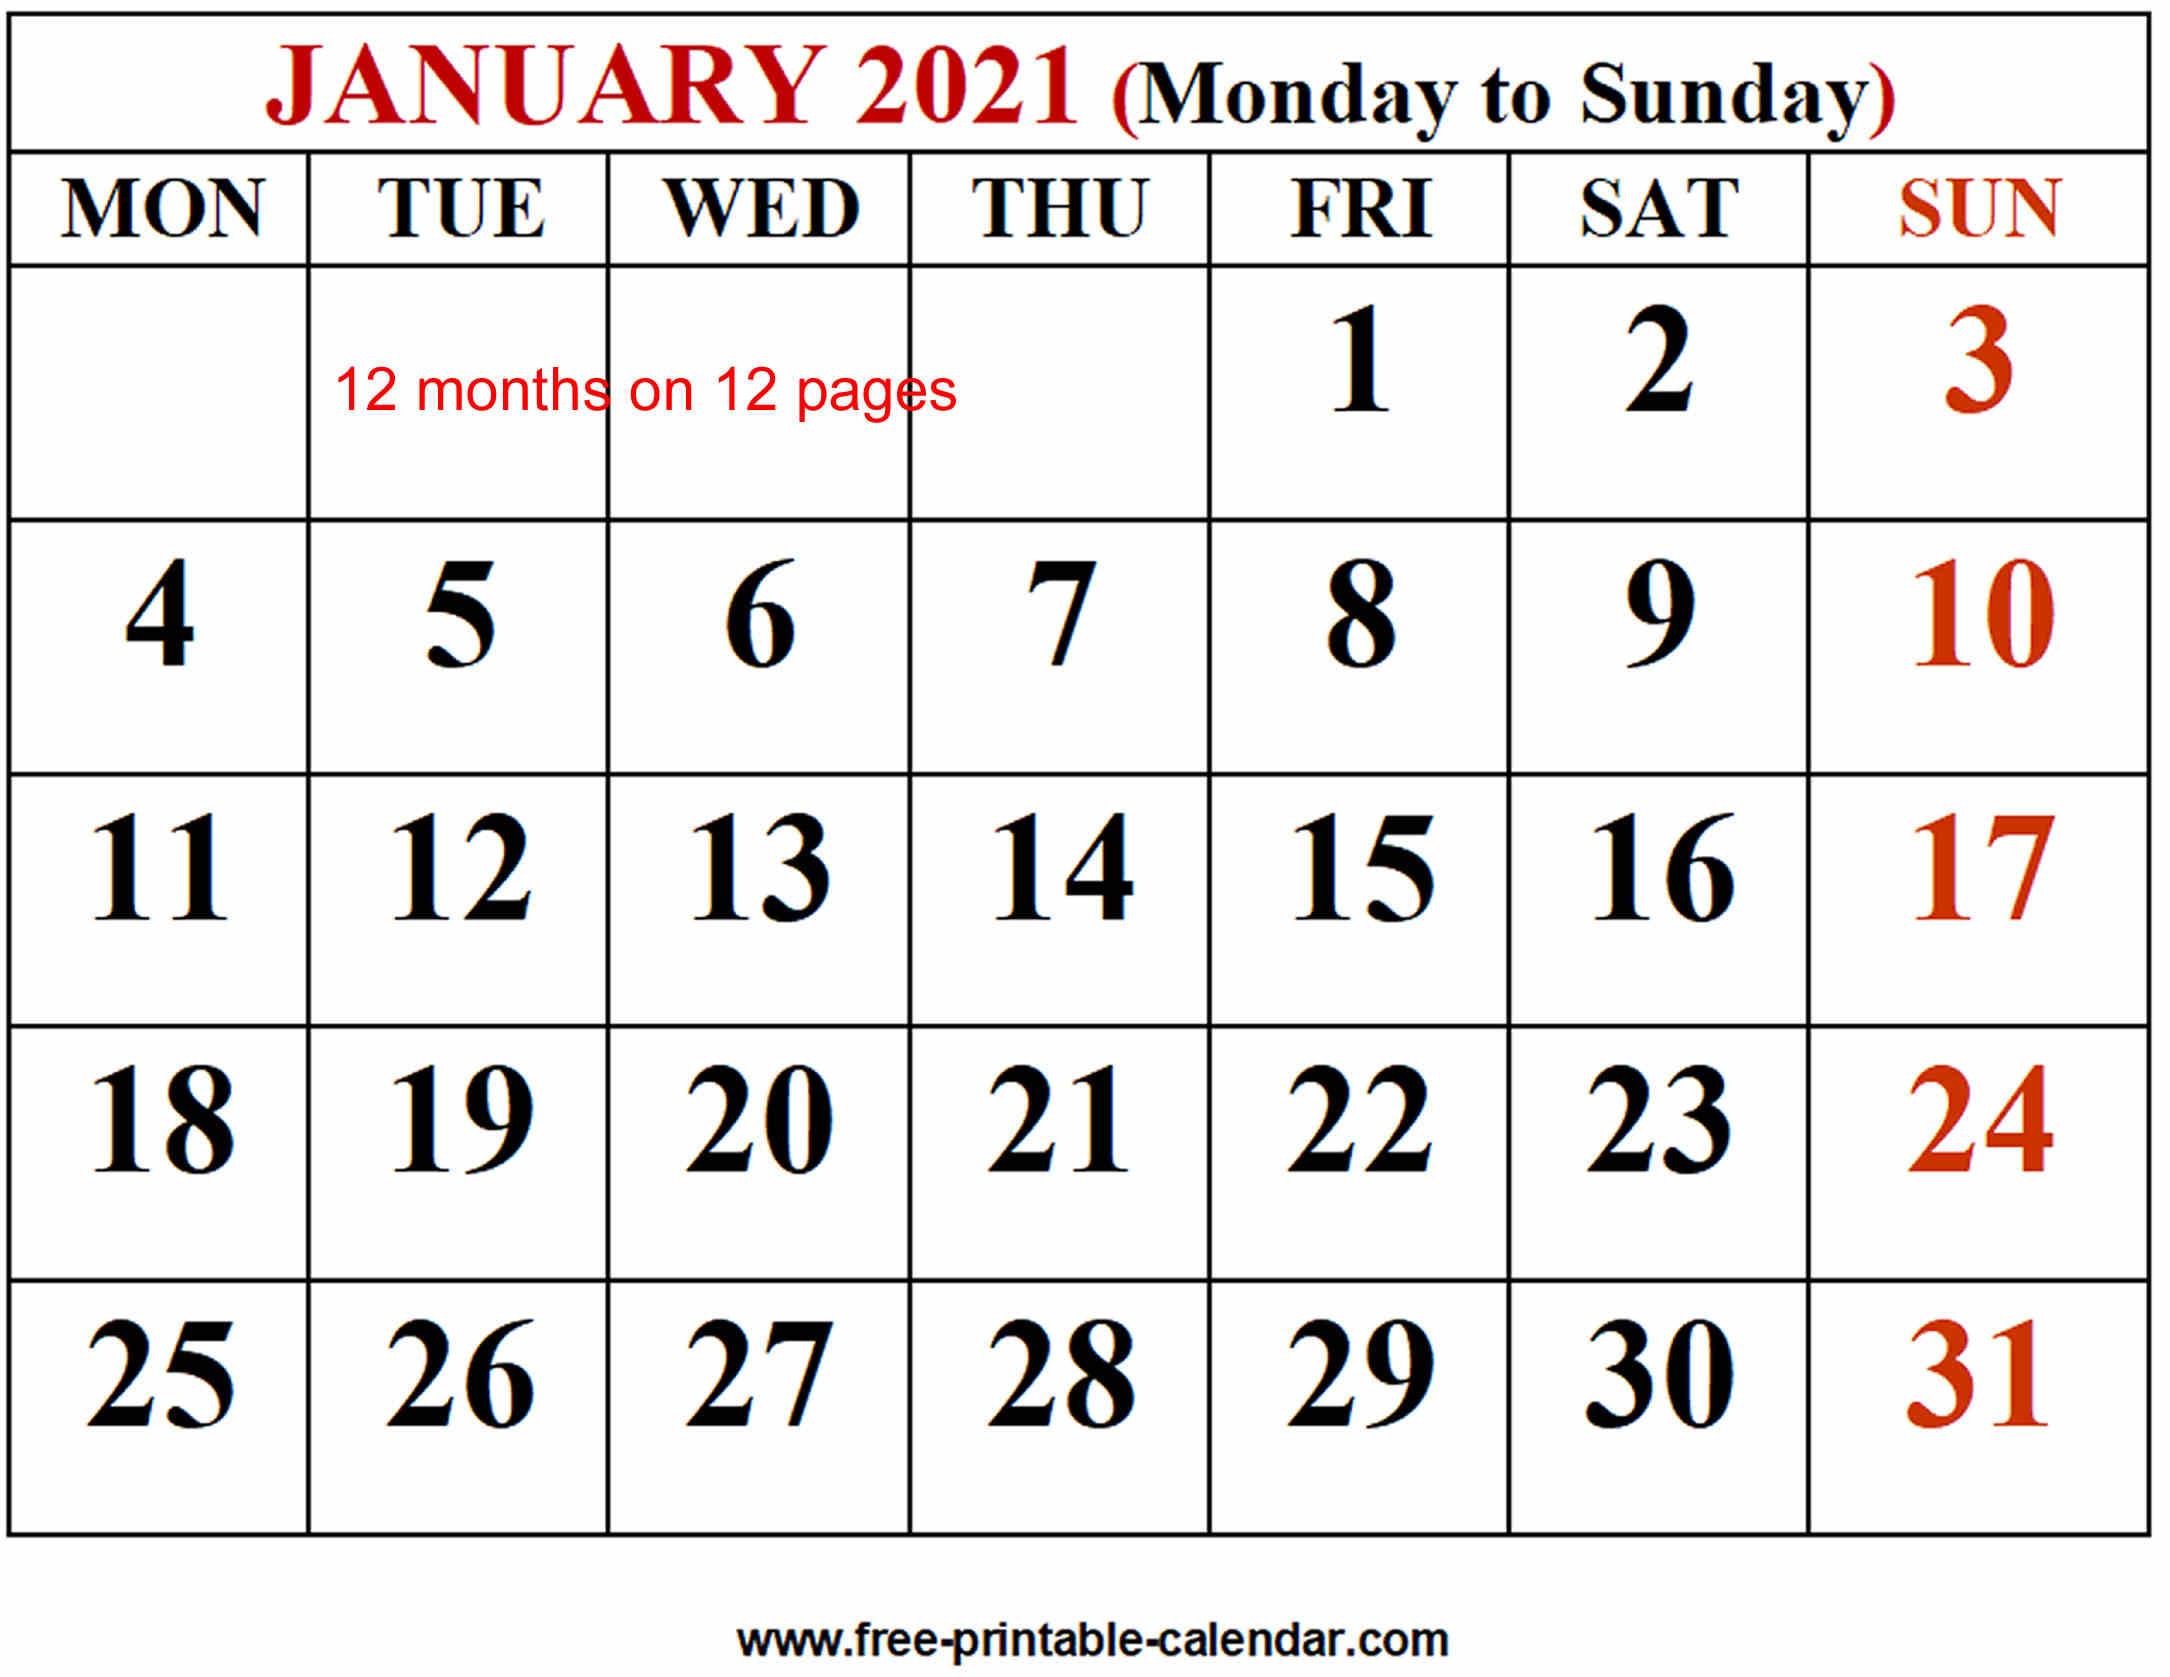 2021 Calendar Template - Free-Printable-Calendar